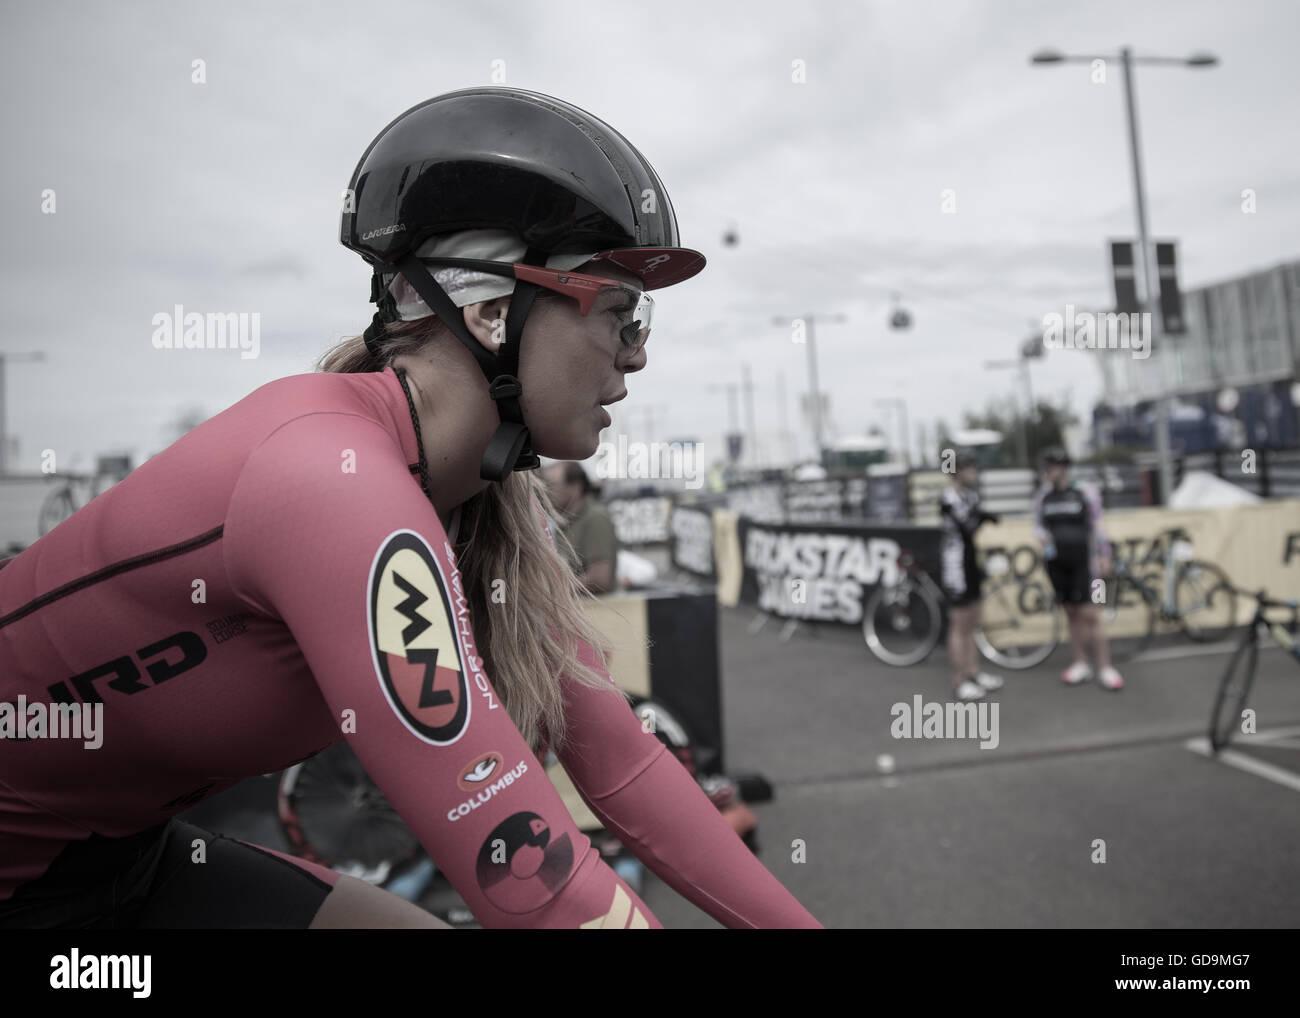 Bike Training Circuit Stock Photos & Bike Training Circuit